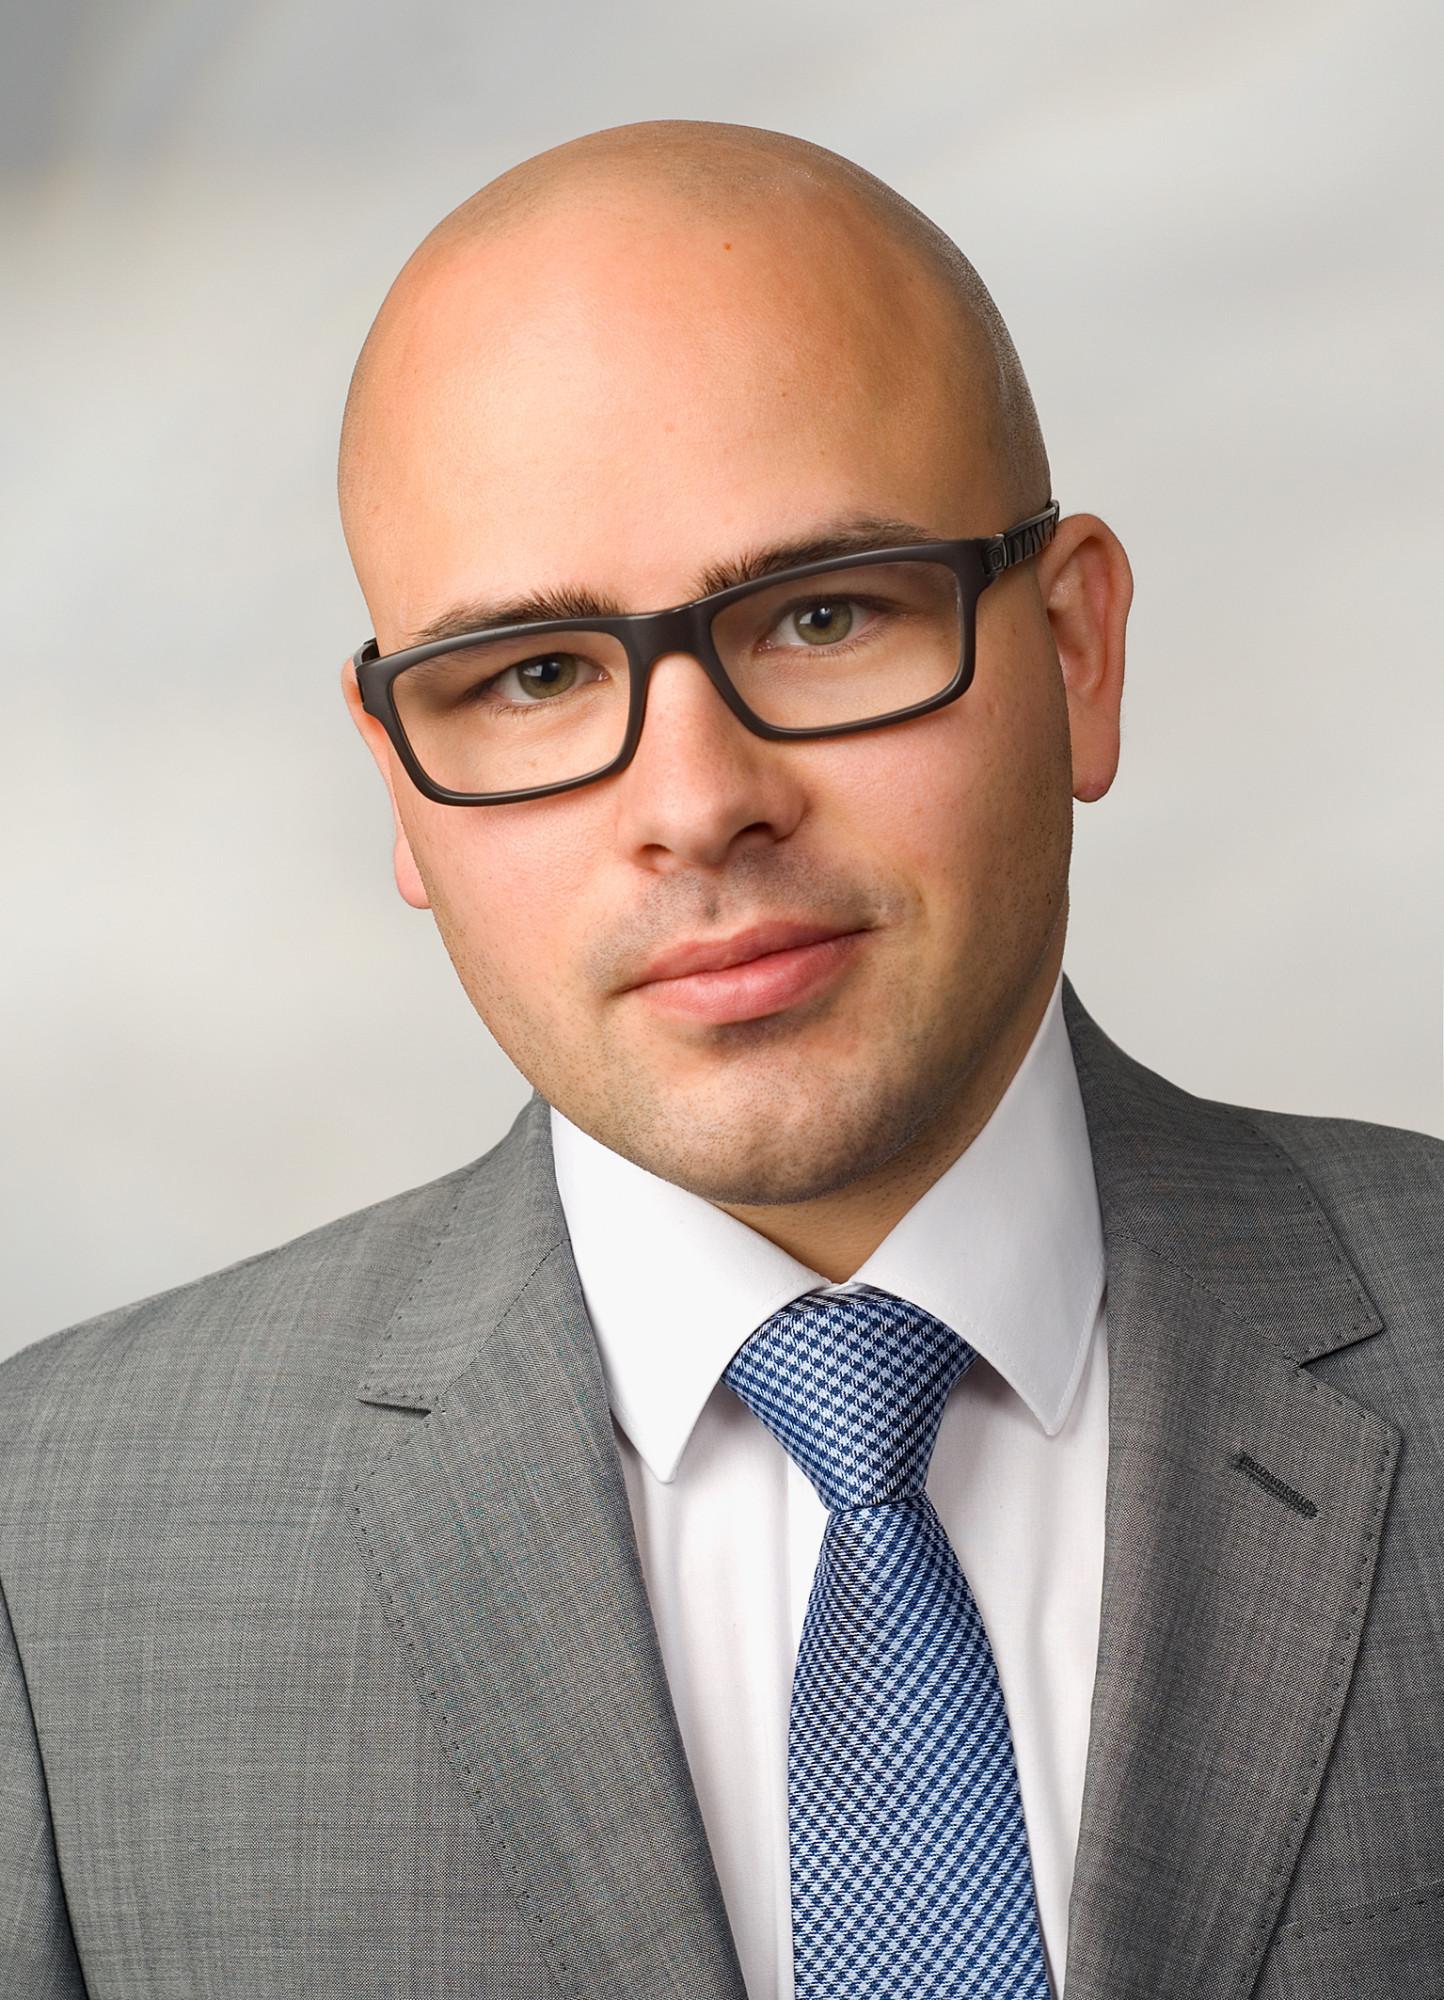 Matthias Busch